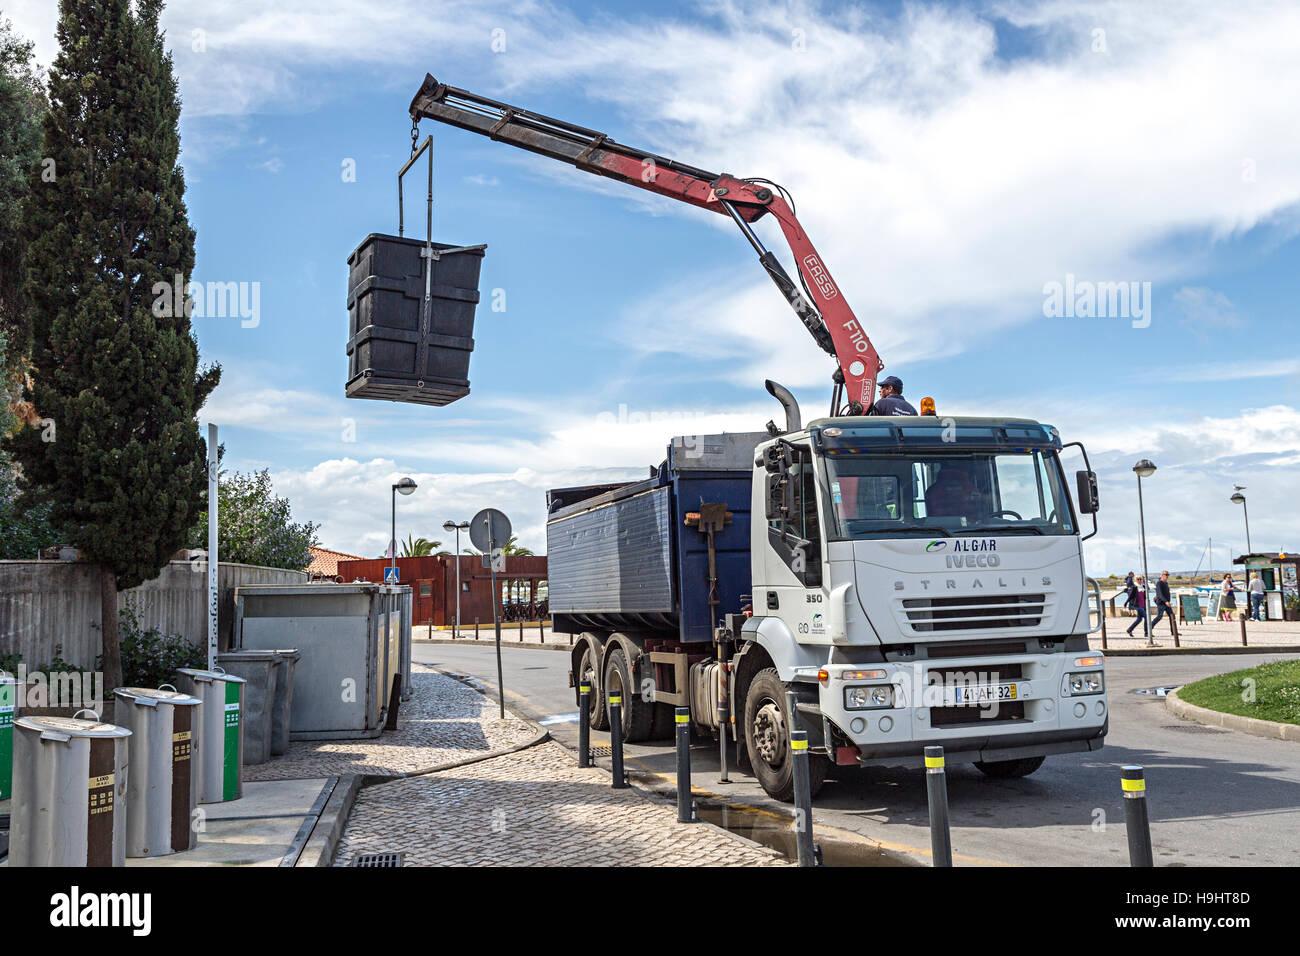 LKW mit Hebebühne arm Abholung recycling Container, Alvor, Algarve, Portugal Stockbild